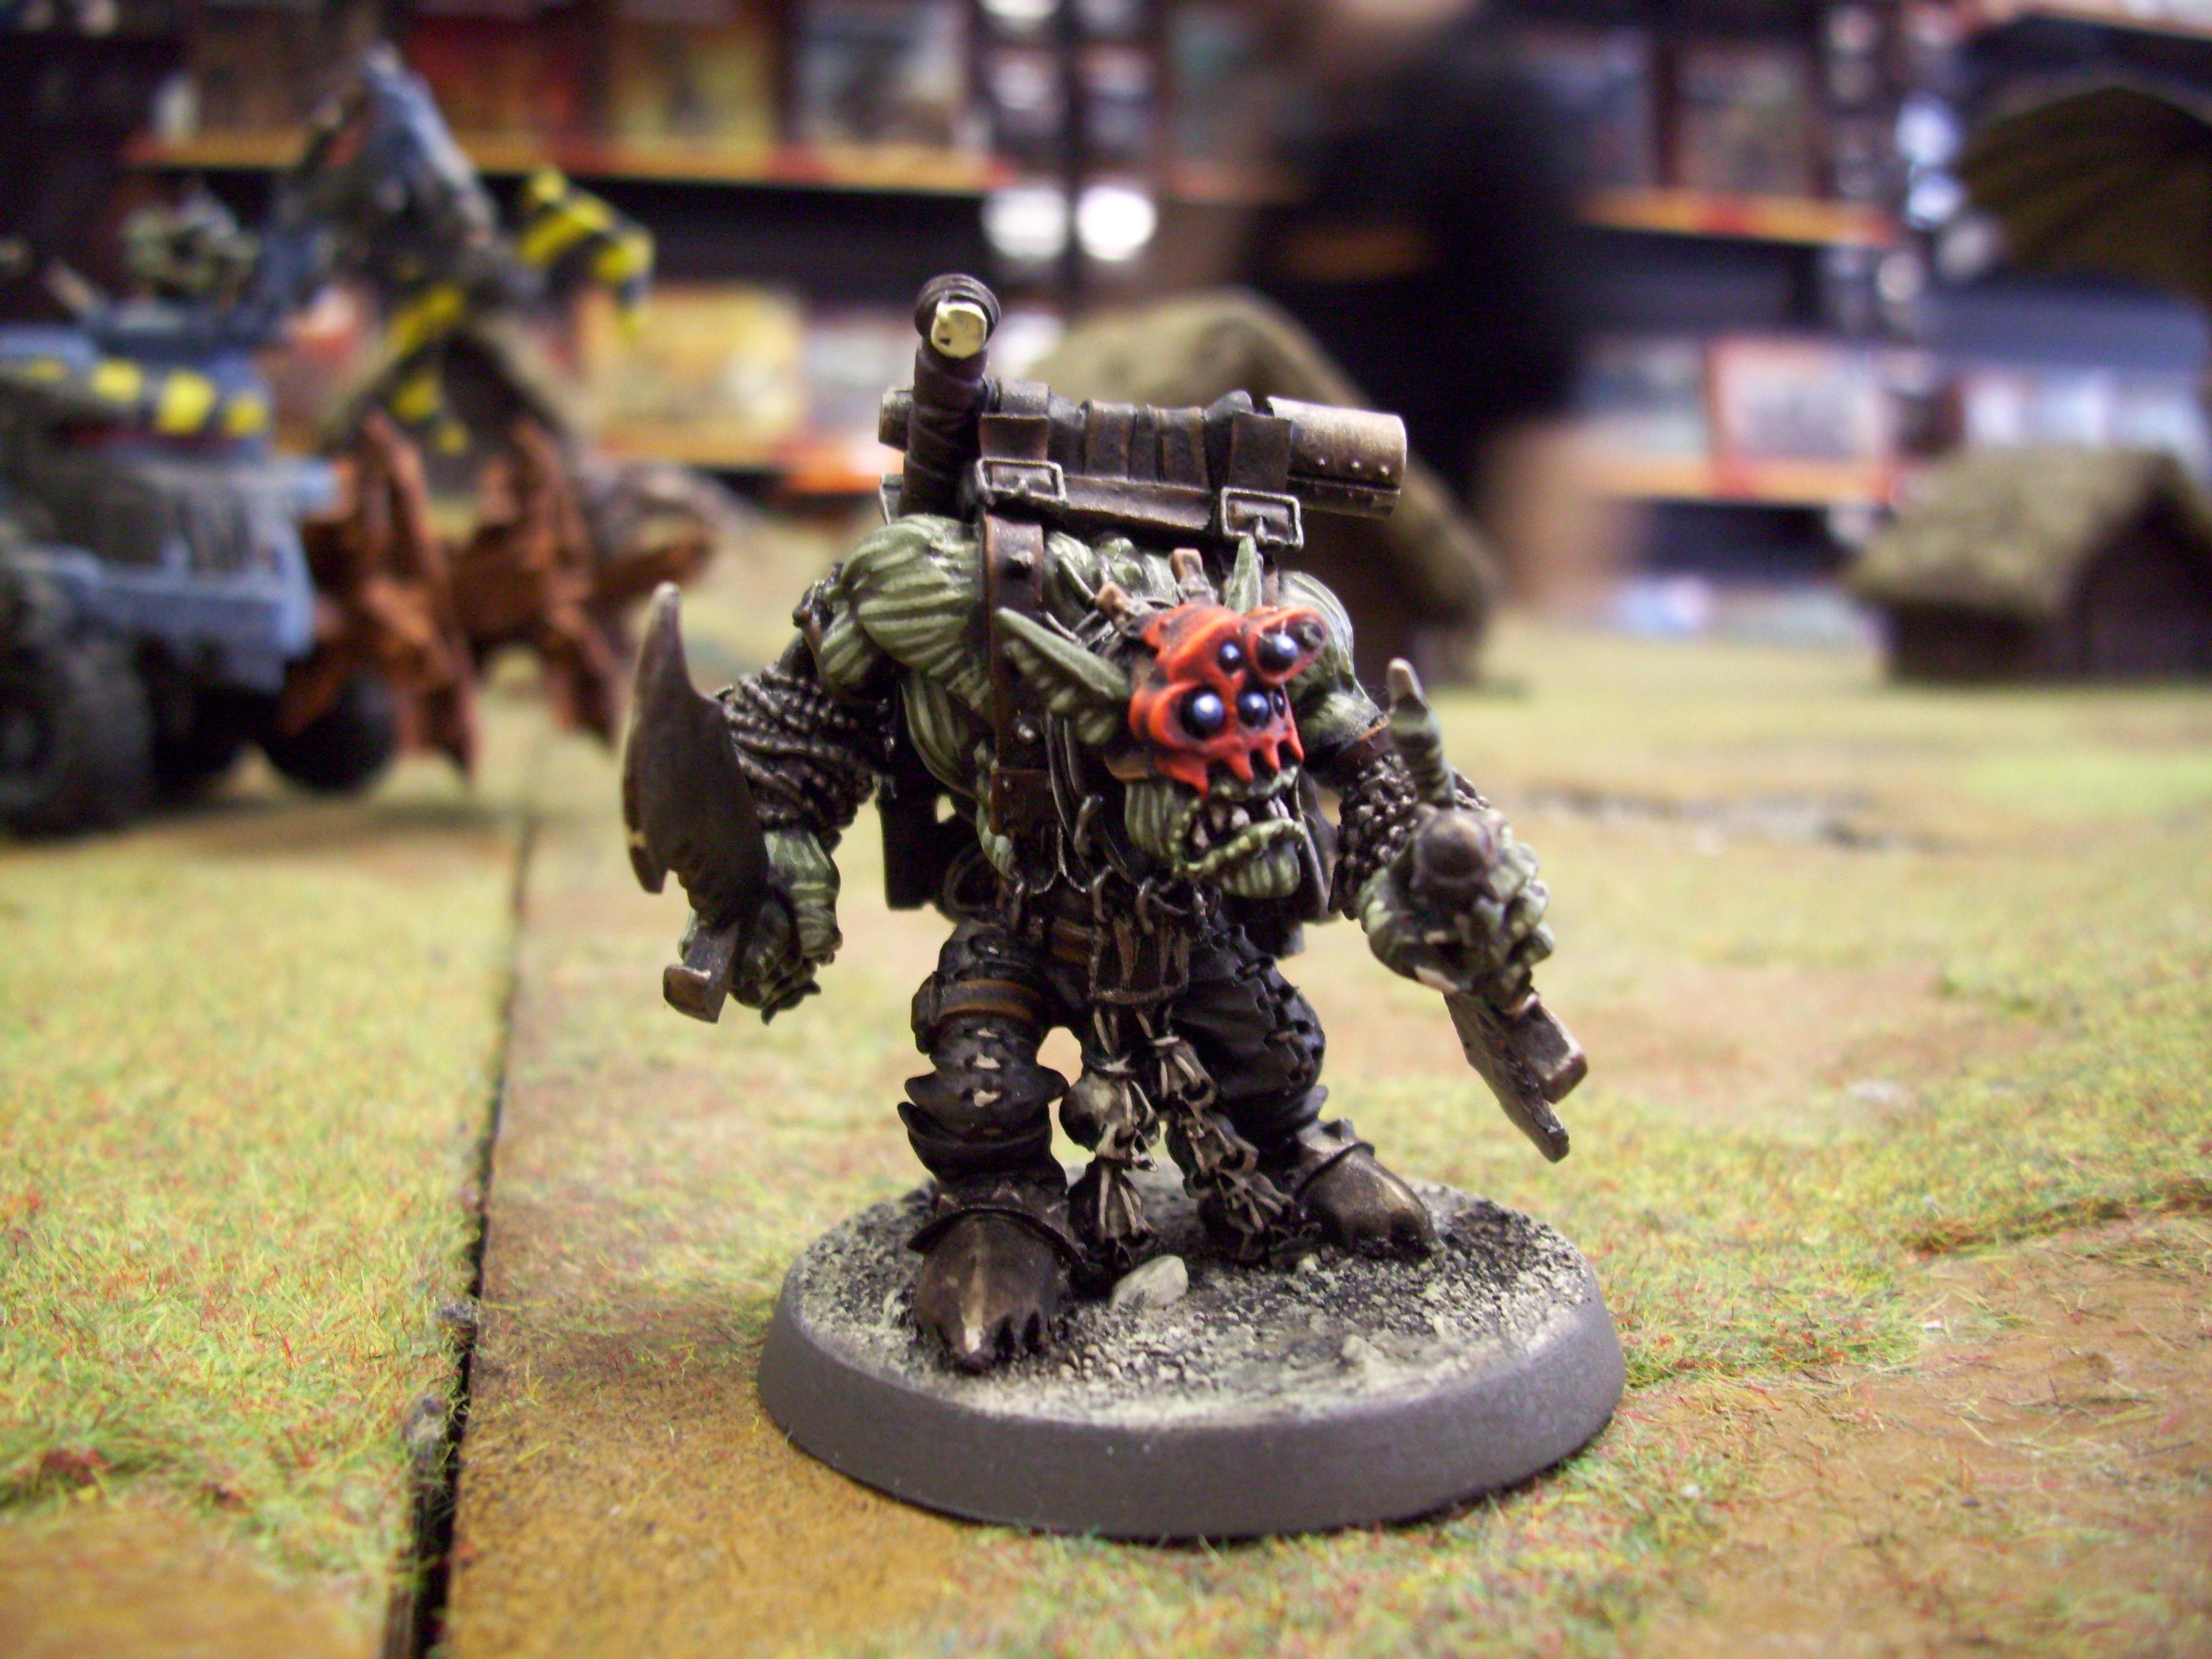 Boss Snikrot, Camouflage, Deff Dread, Deff Dredd, Dredd, Kommando, Orks